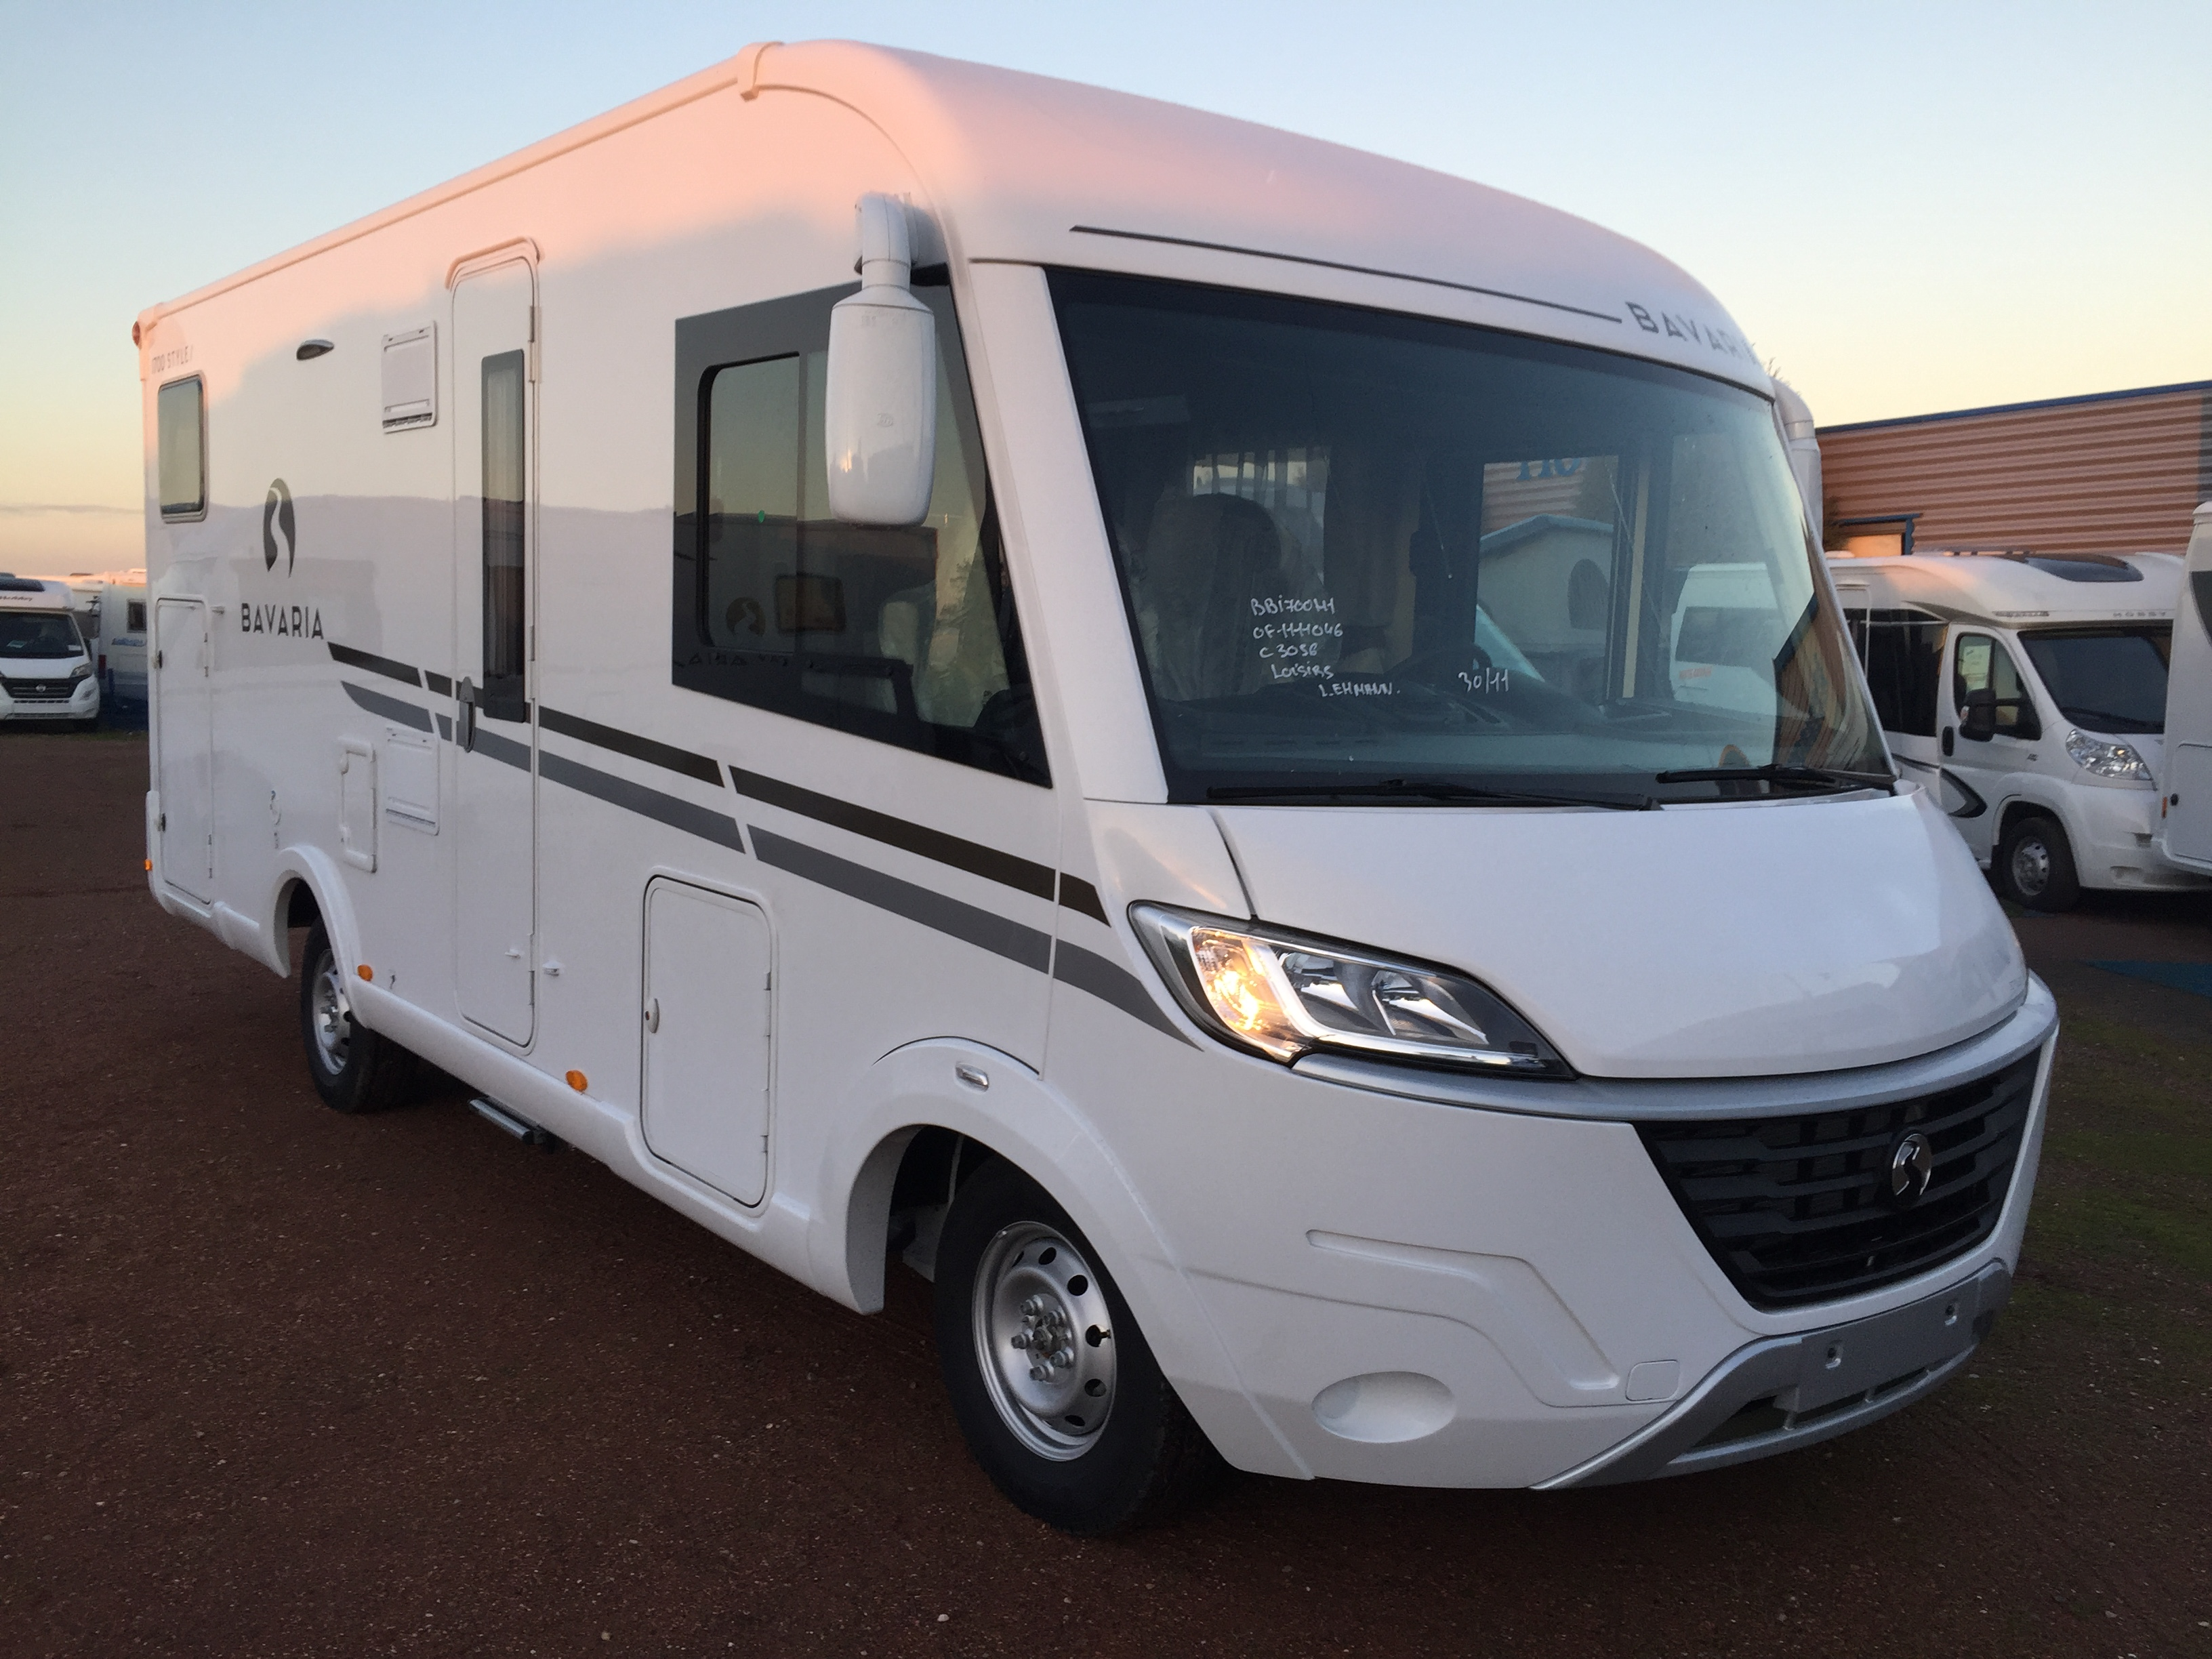 bavaria i 700 gj style neuf de 2017 fiat camping car en vente oberschaeffolsheim rhin 67. Black Bedroom Furniture Sets. Home Design Ideas